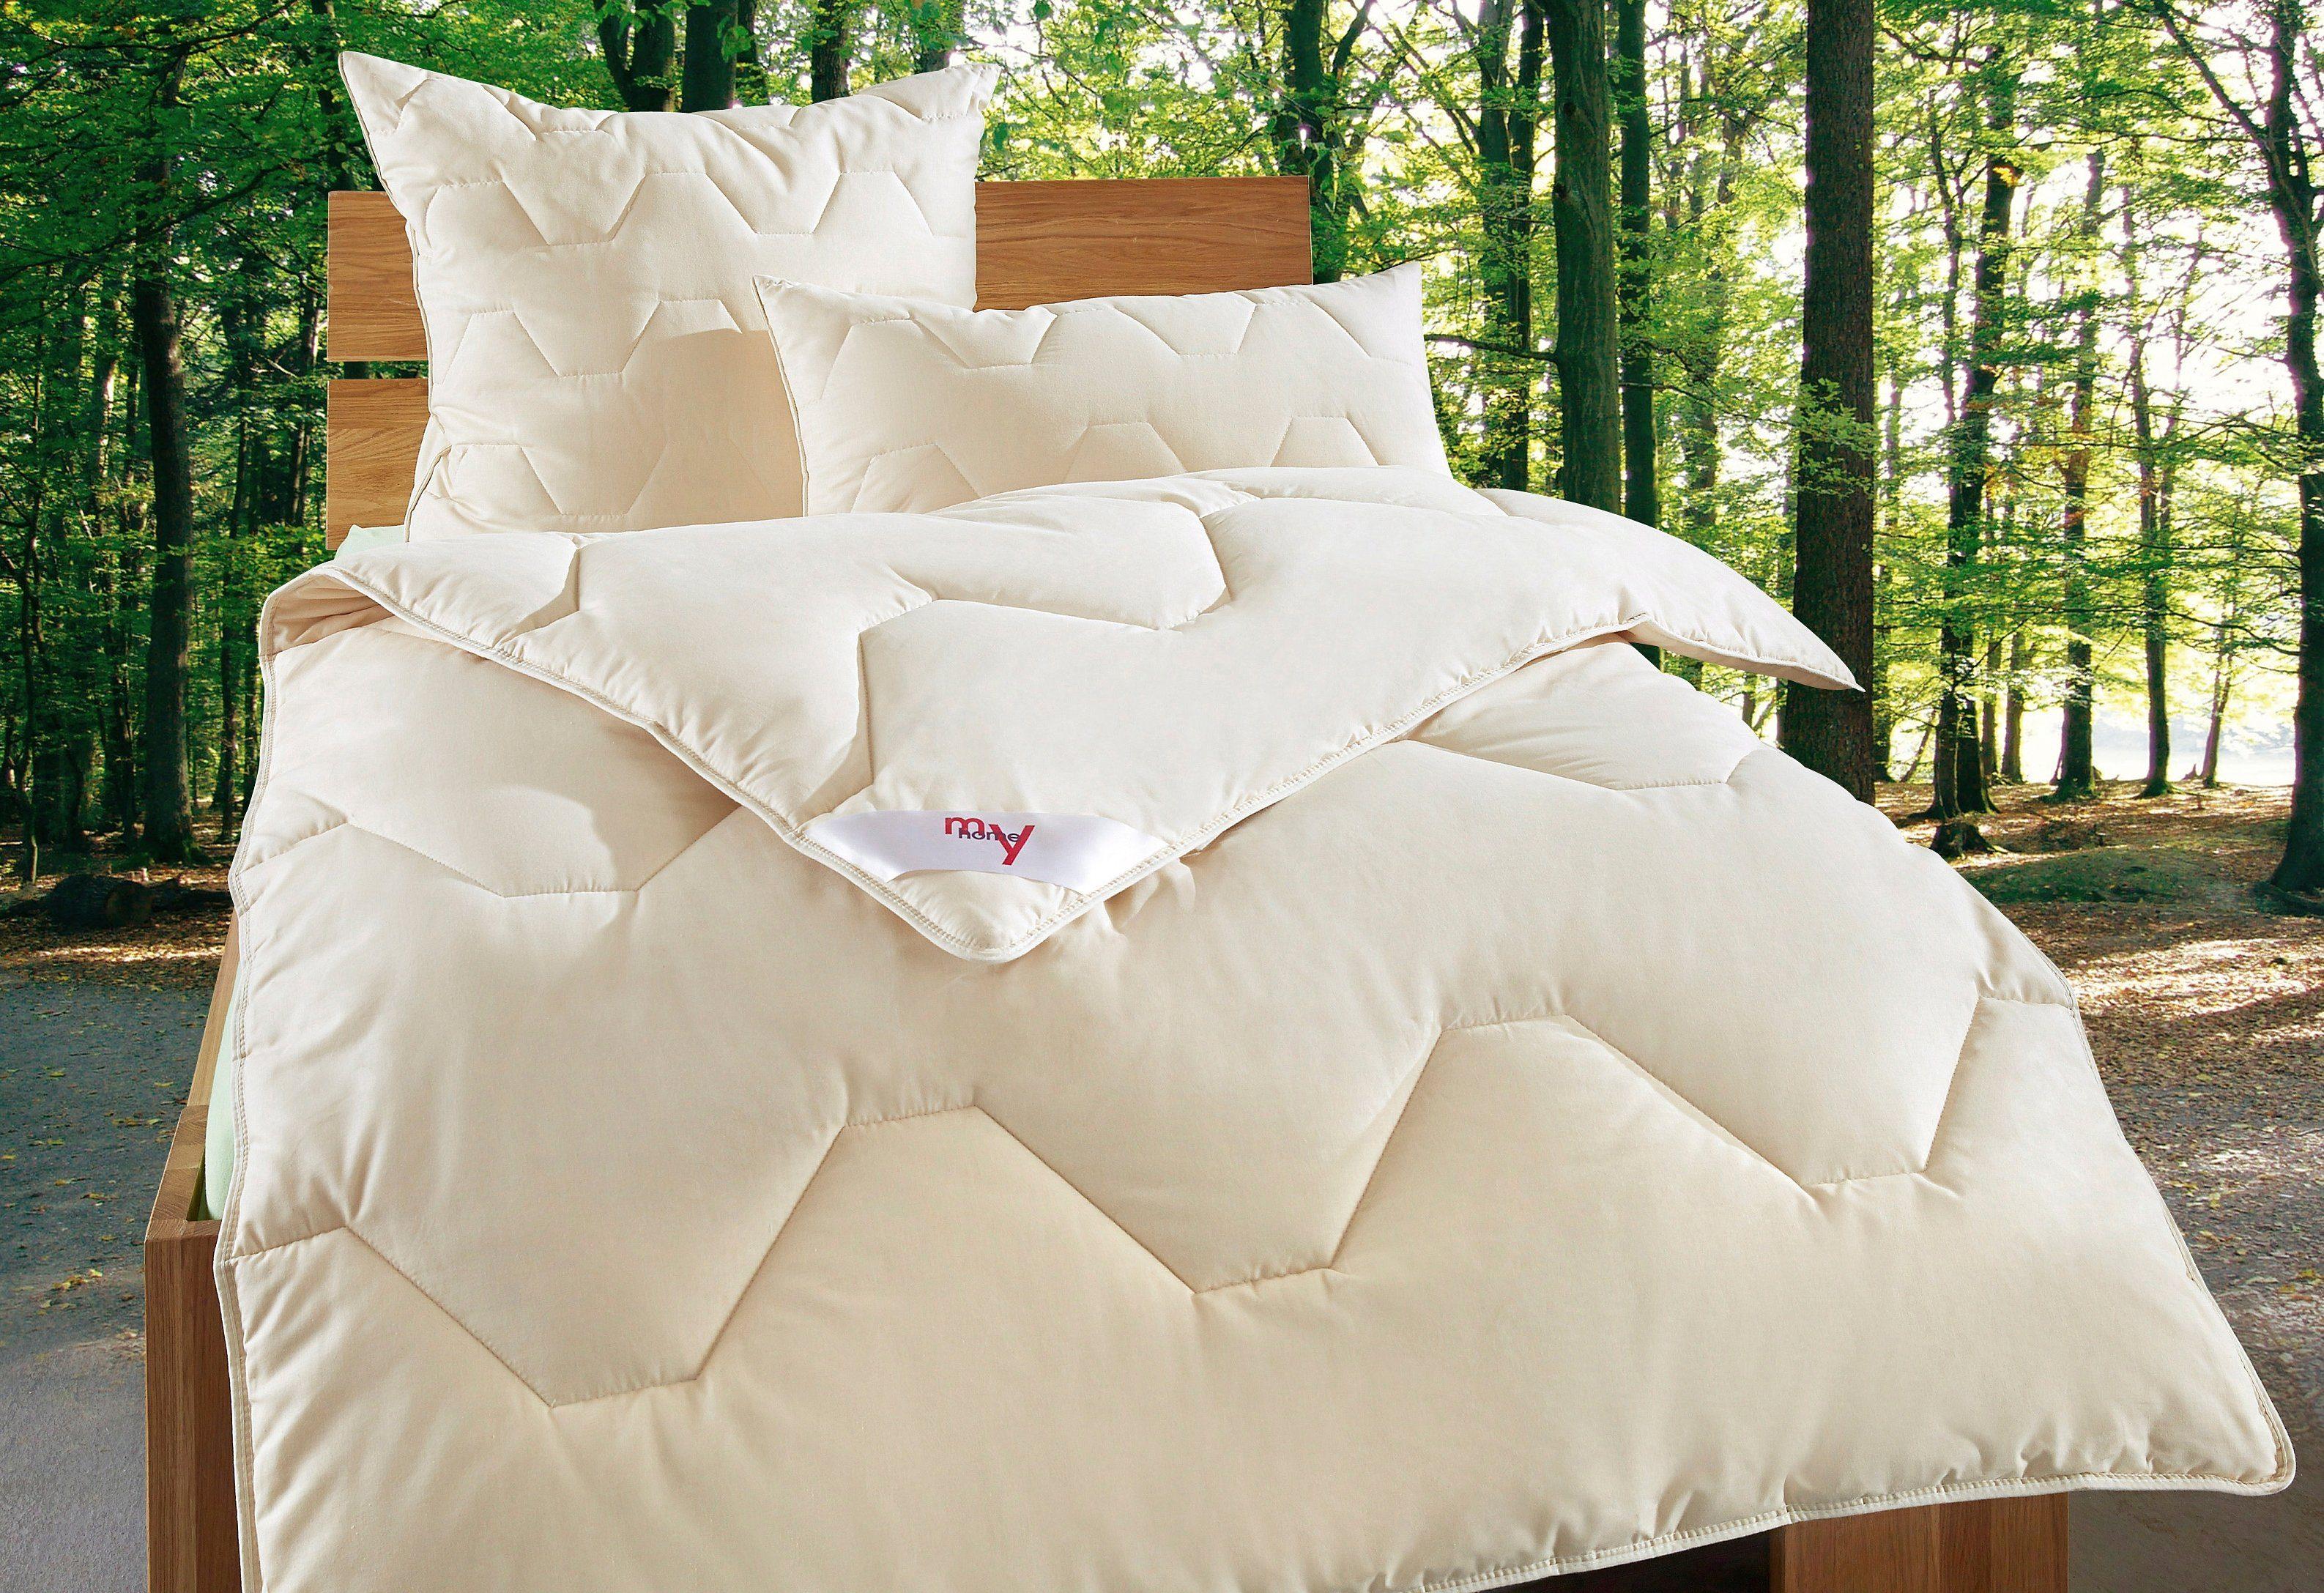 Naturfaserbettdecke, my home »Baumwolle 60 °C«, Warm